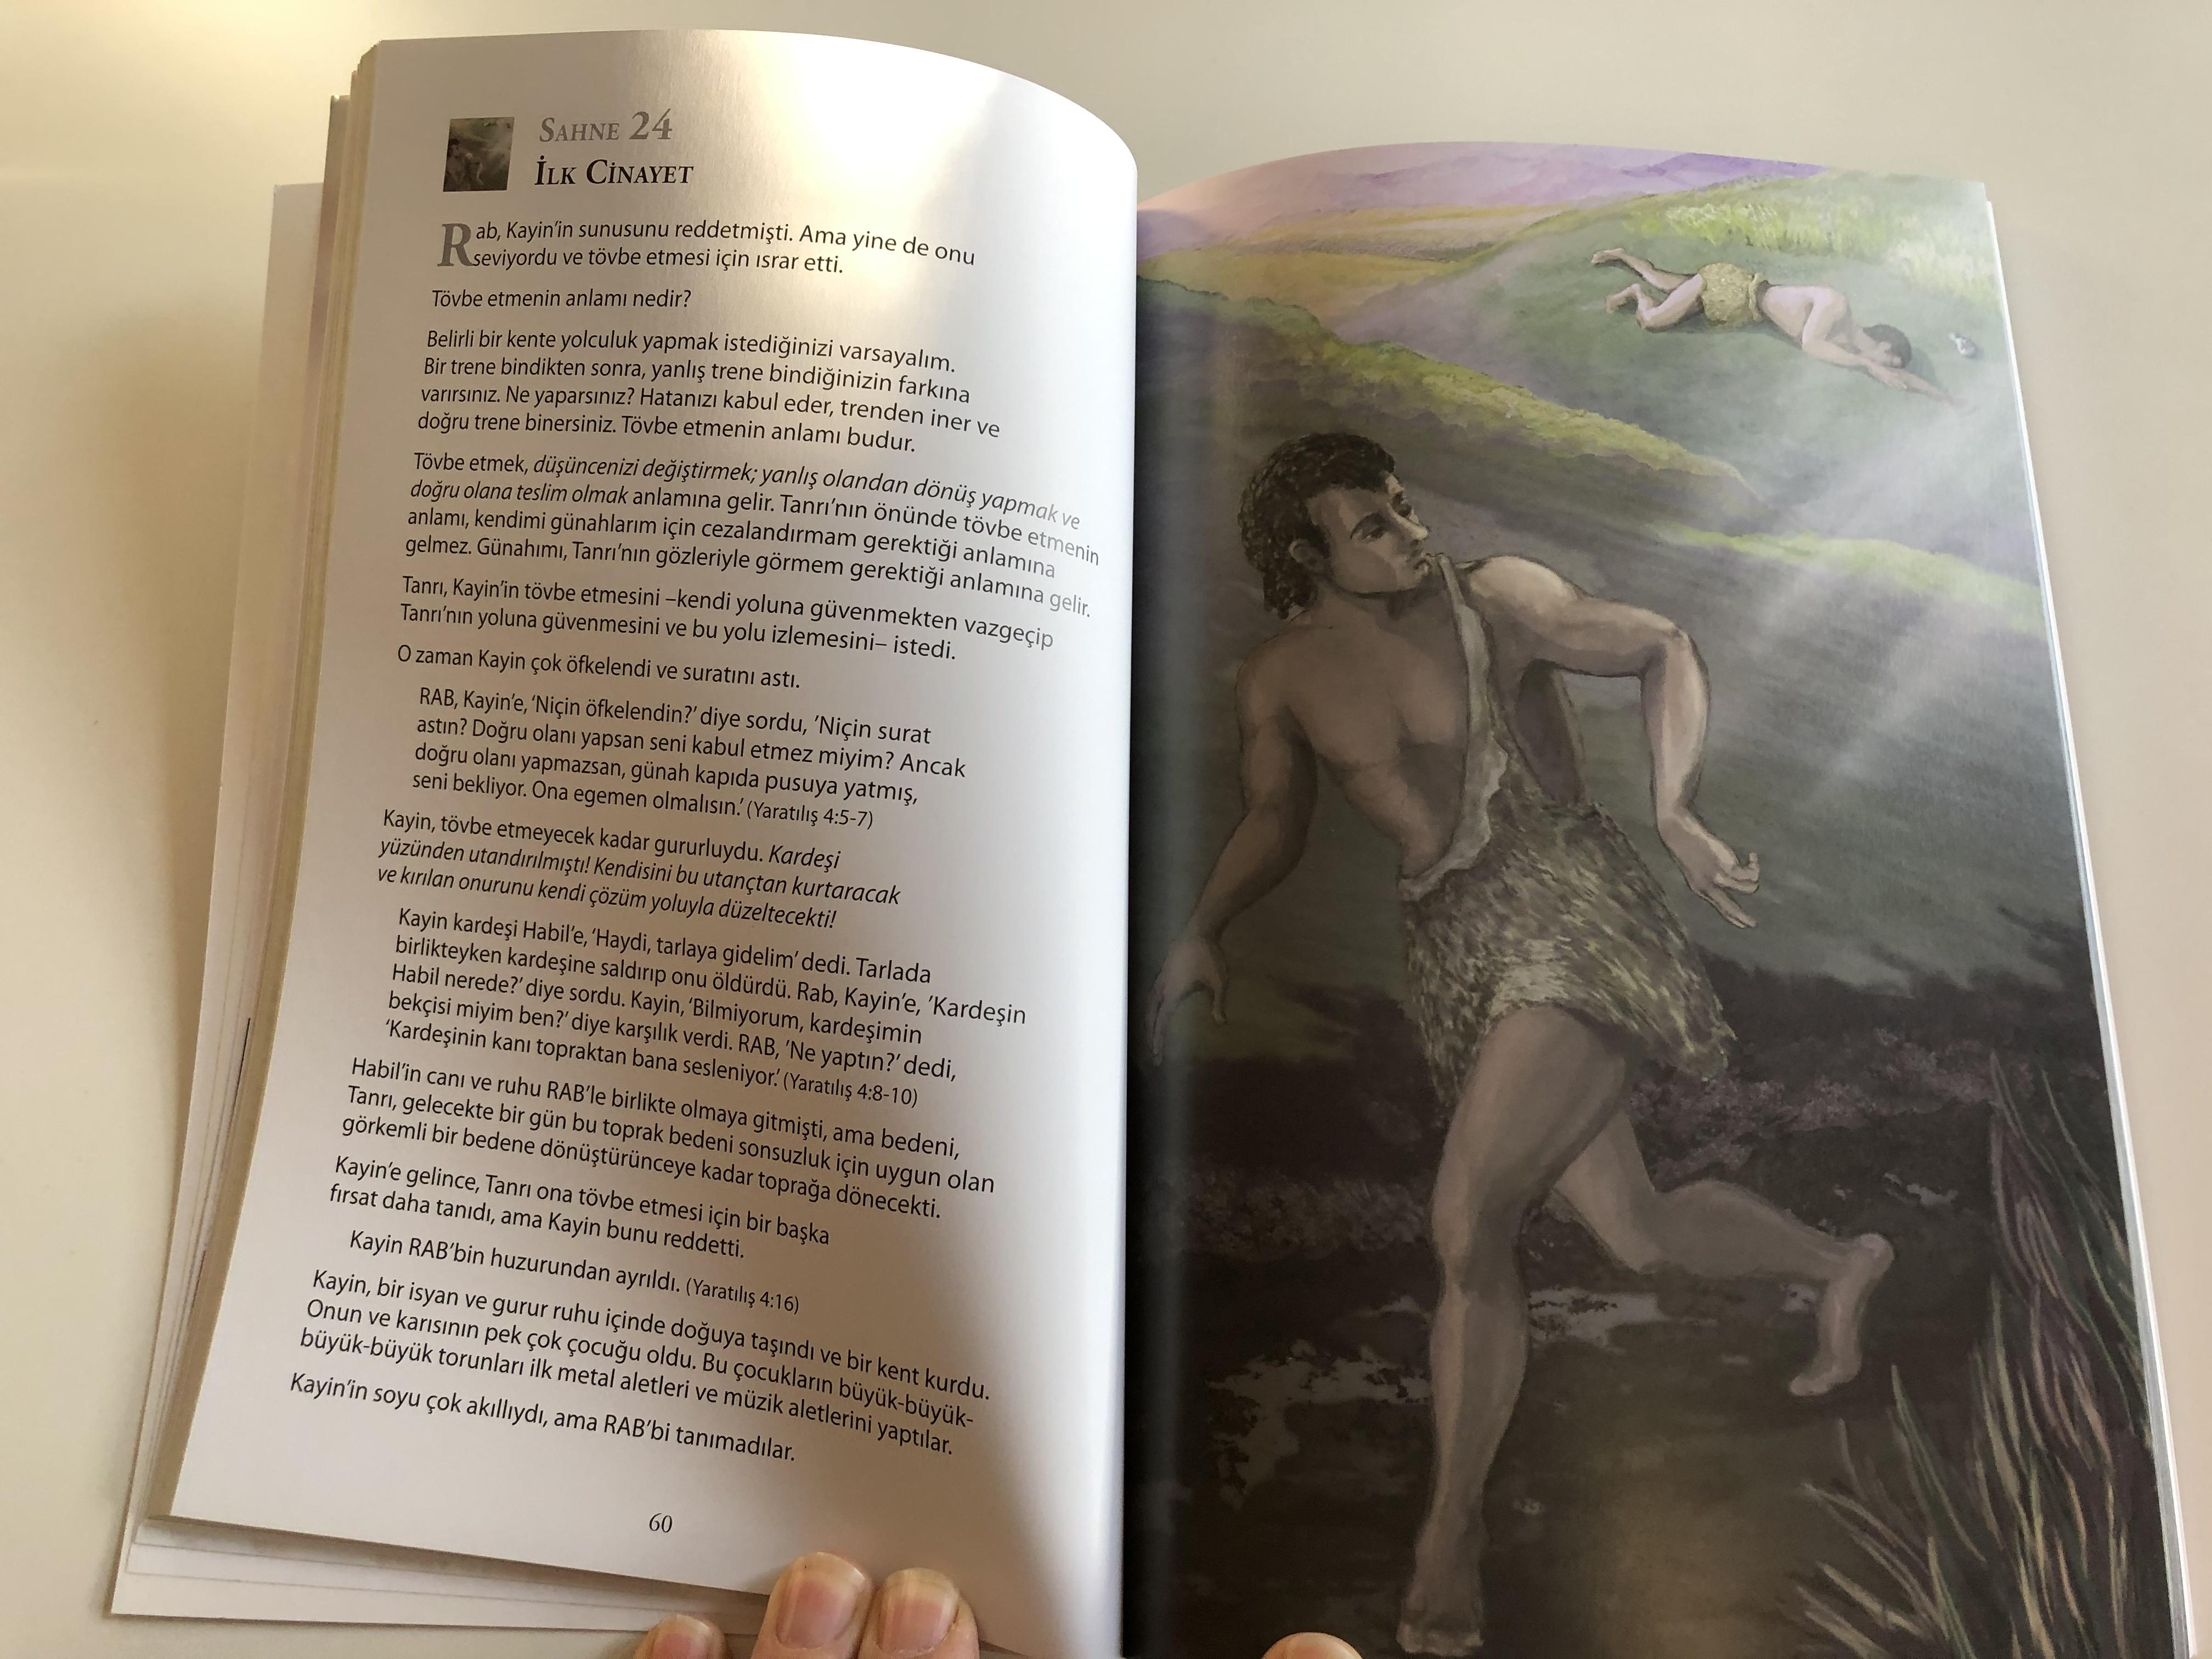 y-celik-krali-king-of-glory-70-bible-stories-for-children-turkish-language-edition-by-p.-d.-bramsen-8.jpg